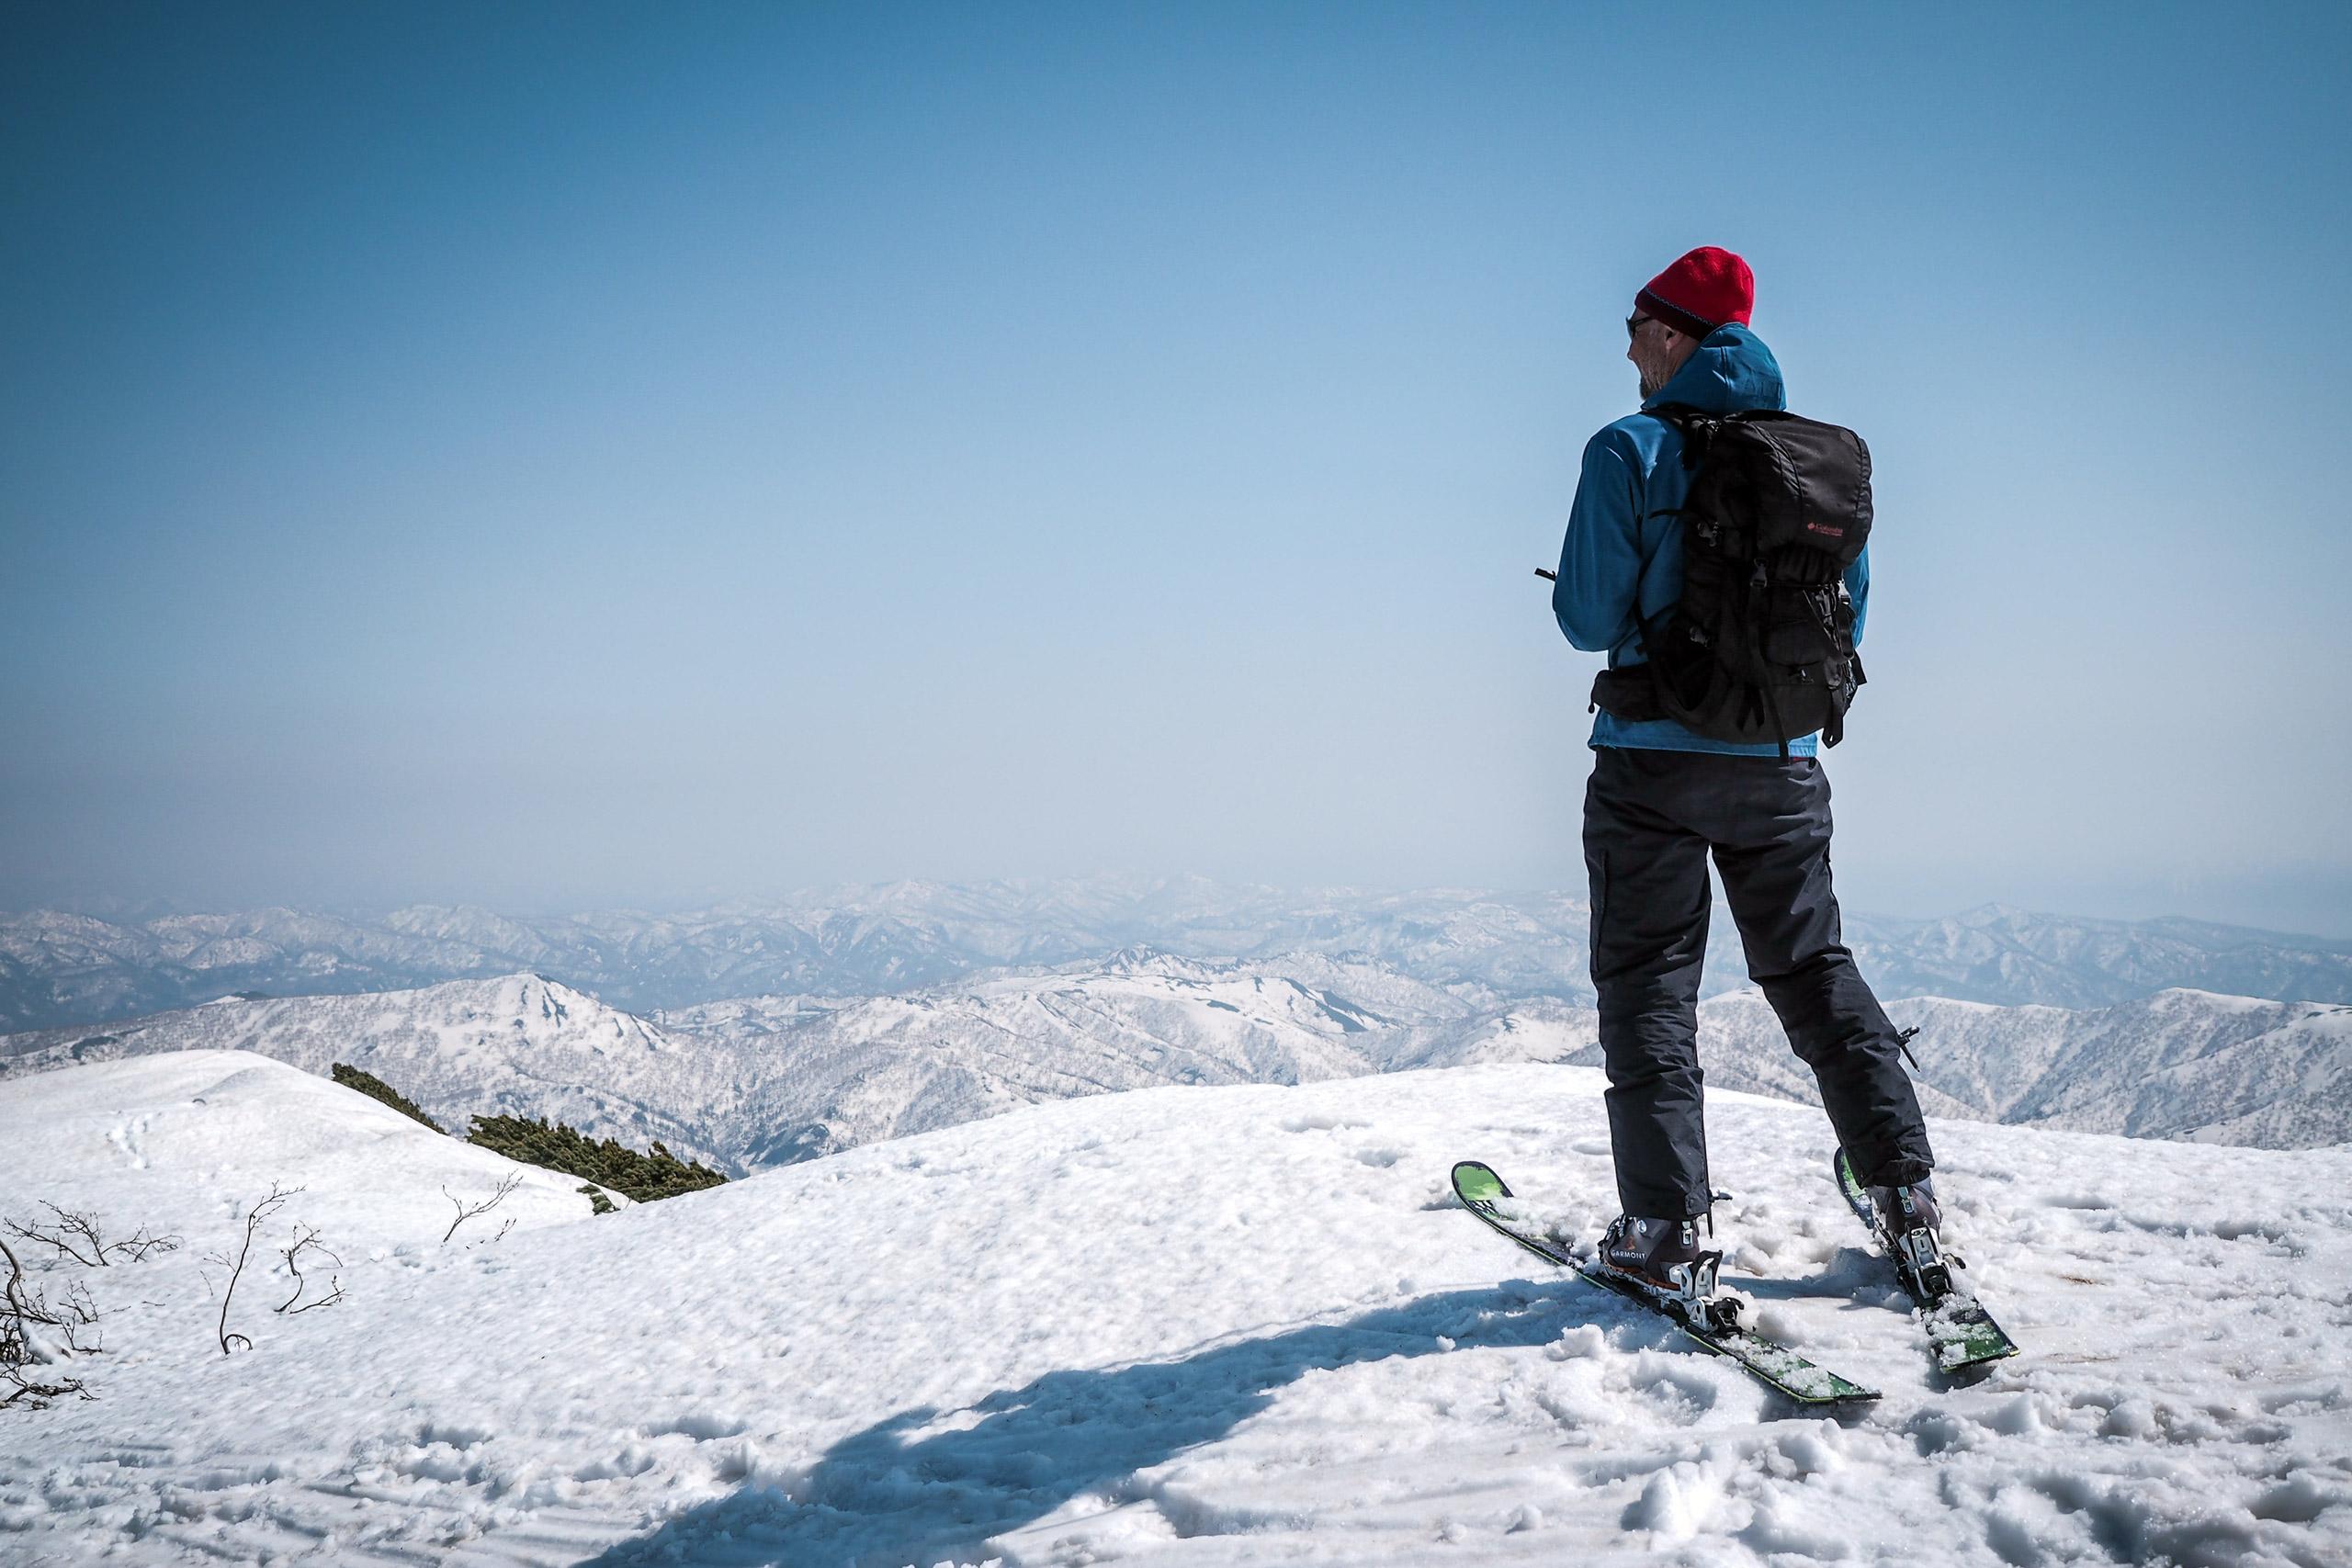 man on skis on top of mountain